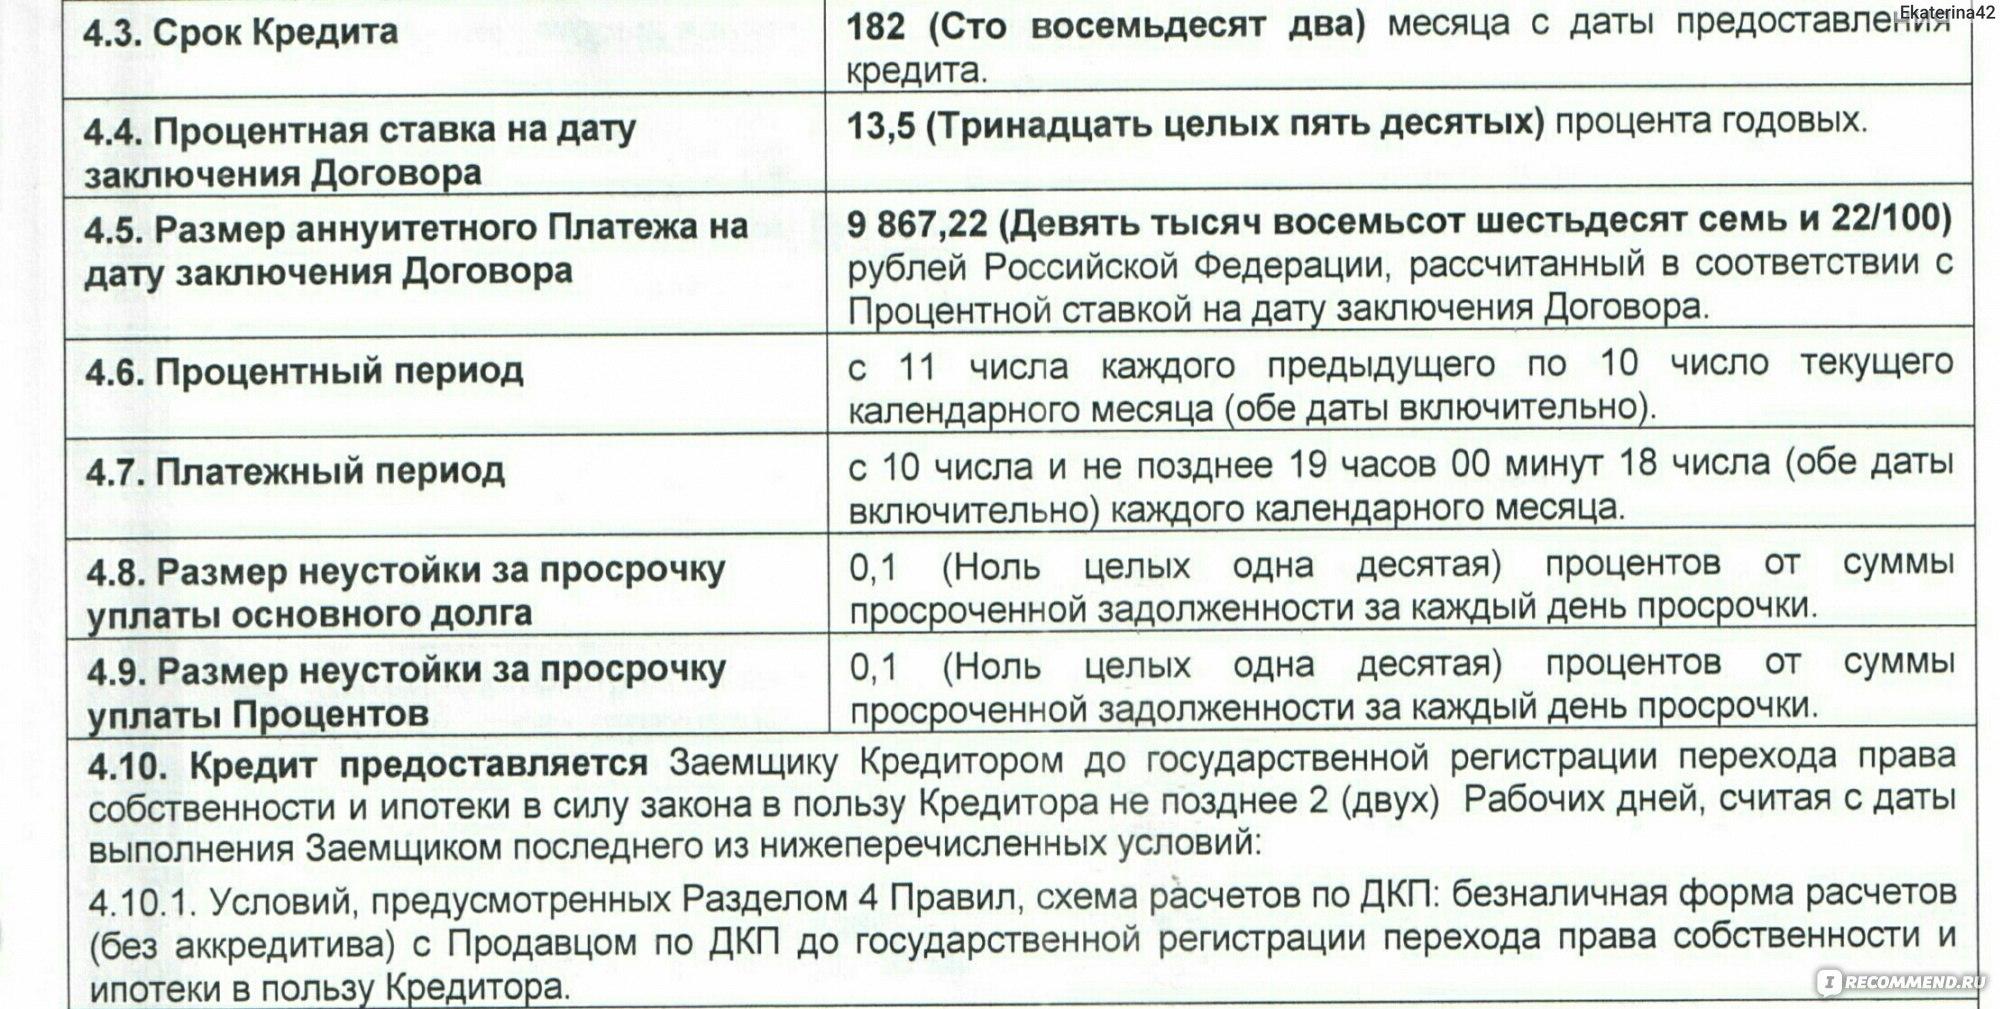 Почта банк кредит без справки